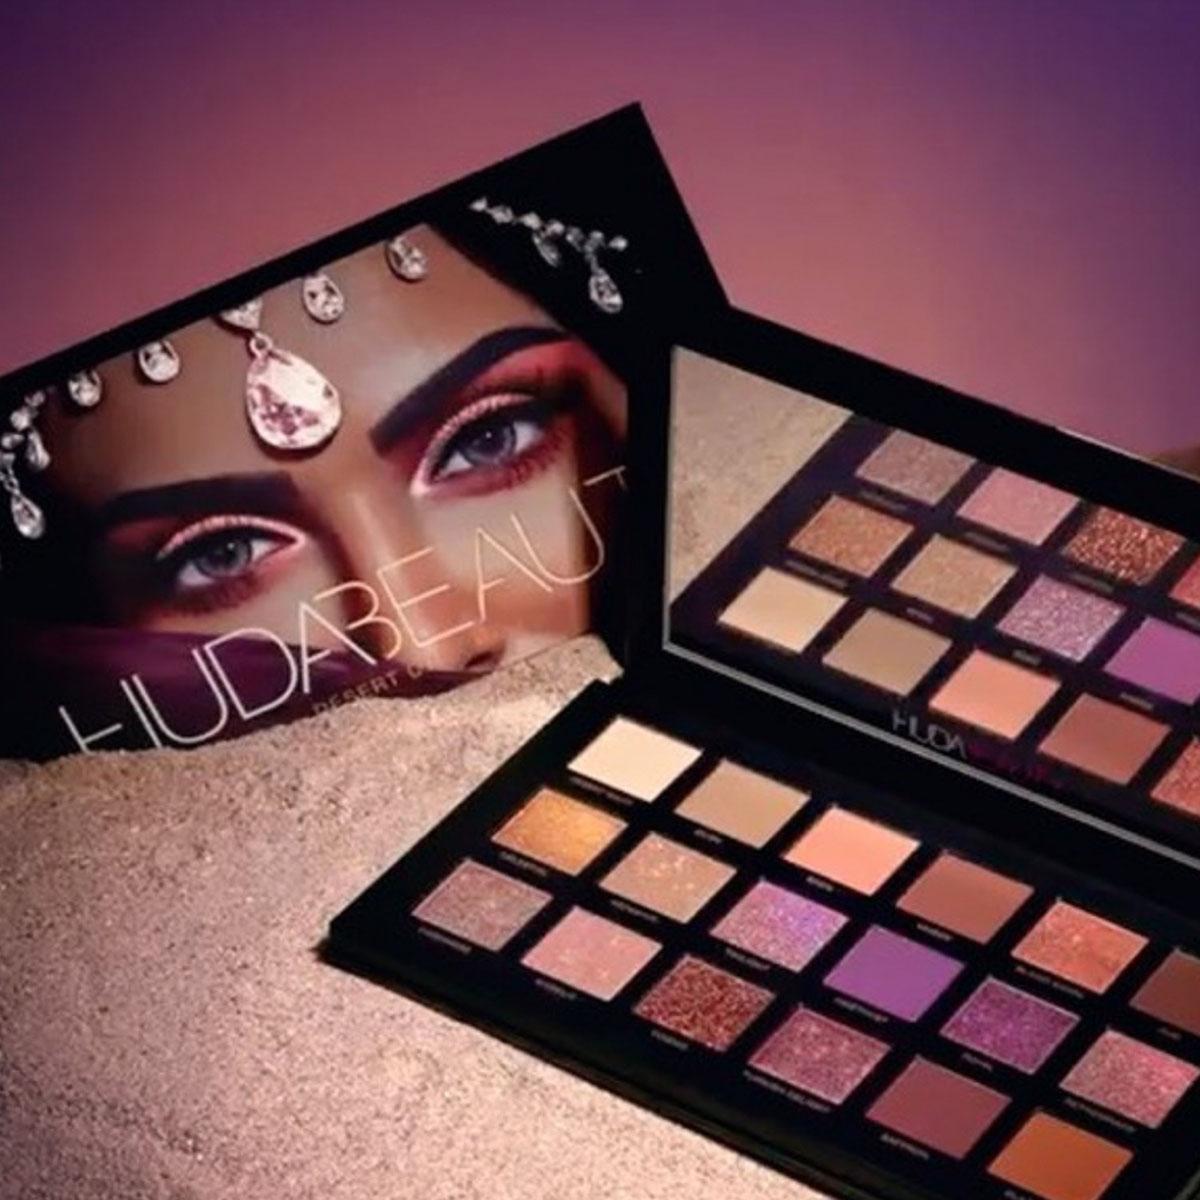 Huda Beauty Desert Dusk Eyeshadow Palette Review & Swatches